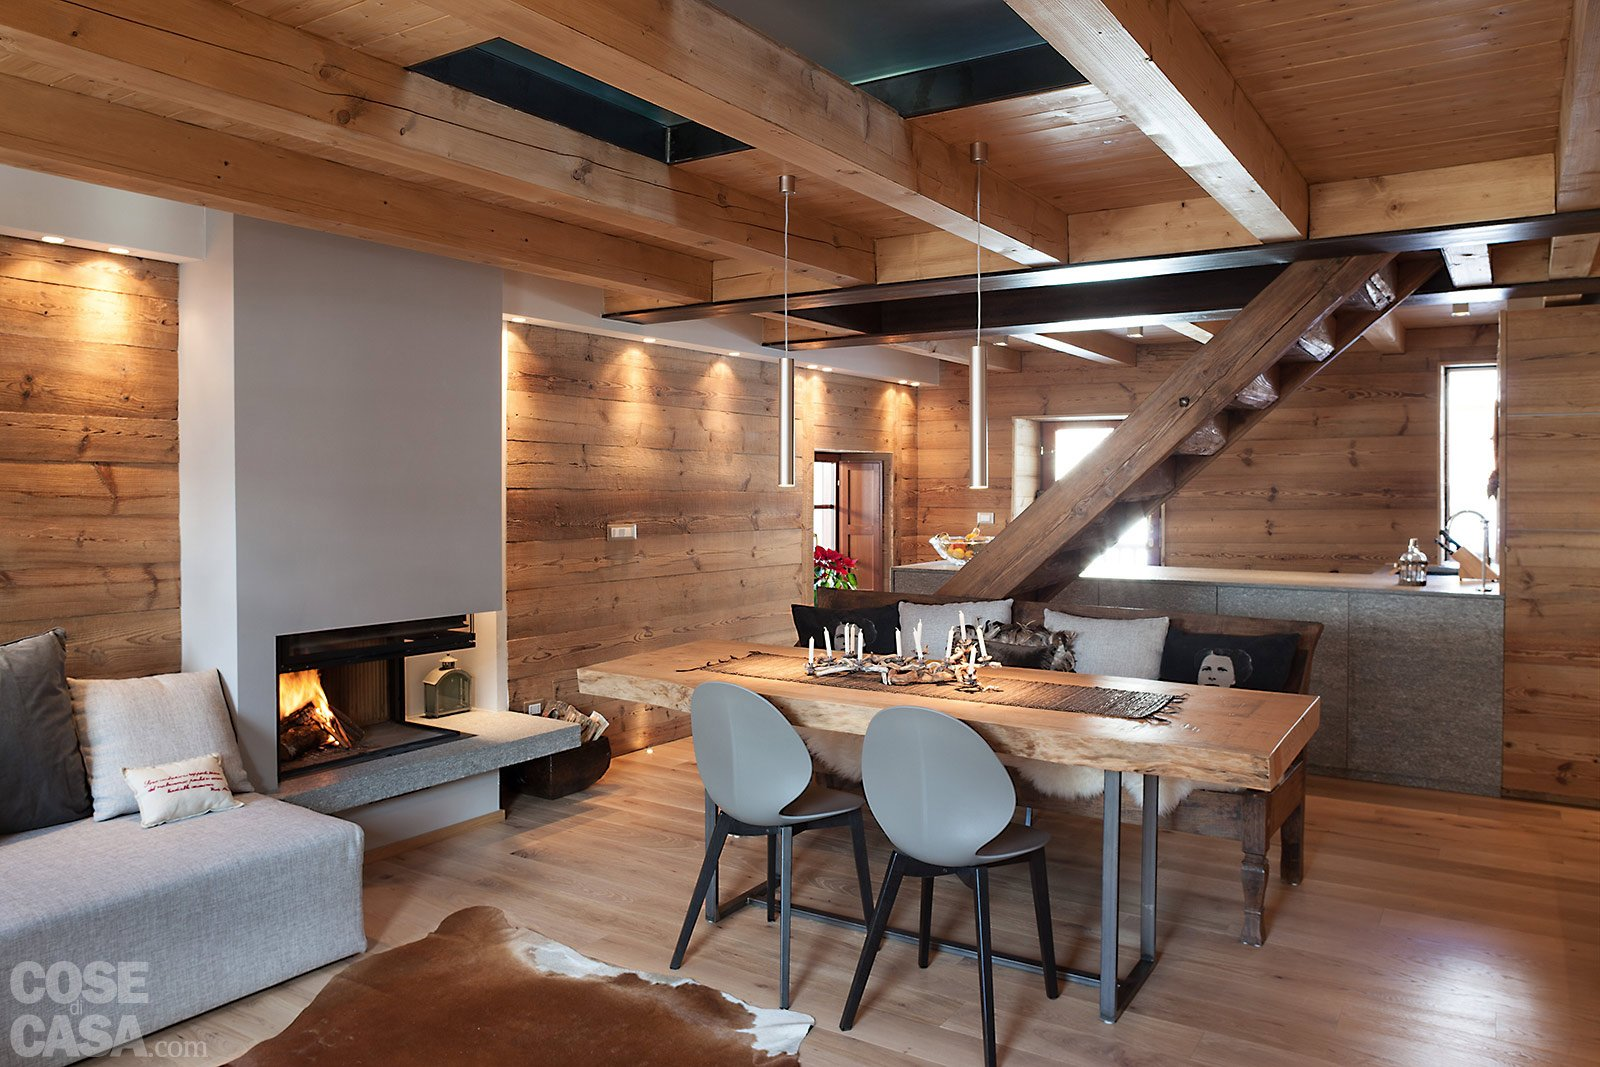 Atmosfera da chalet in una casa moderna cose di casa for Case di legno rustico